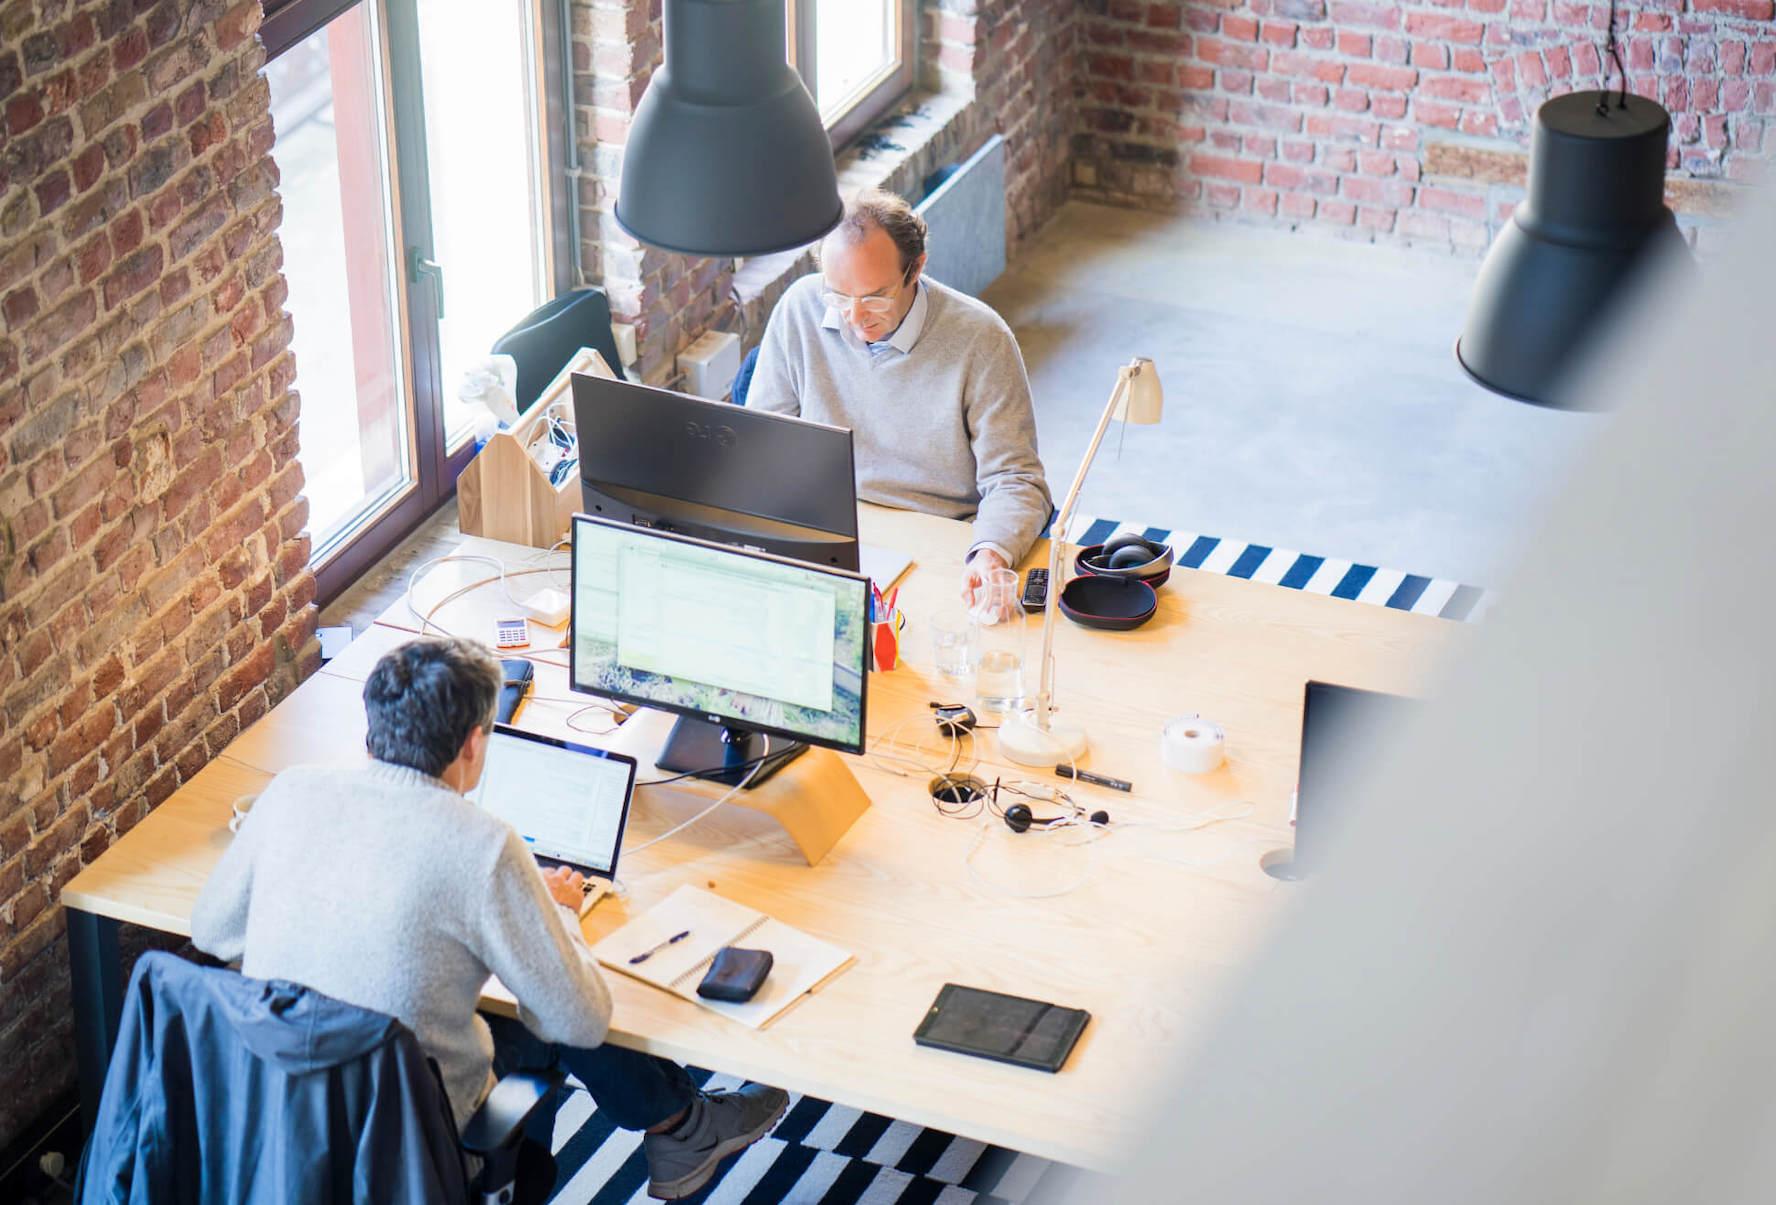 Employees working at their desks.